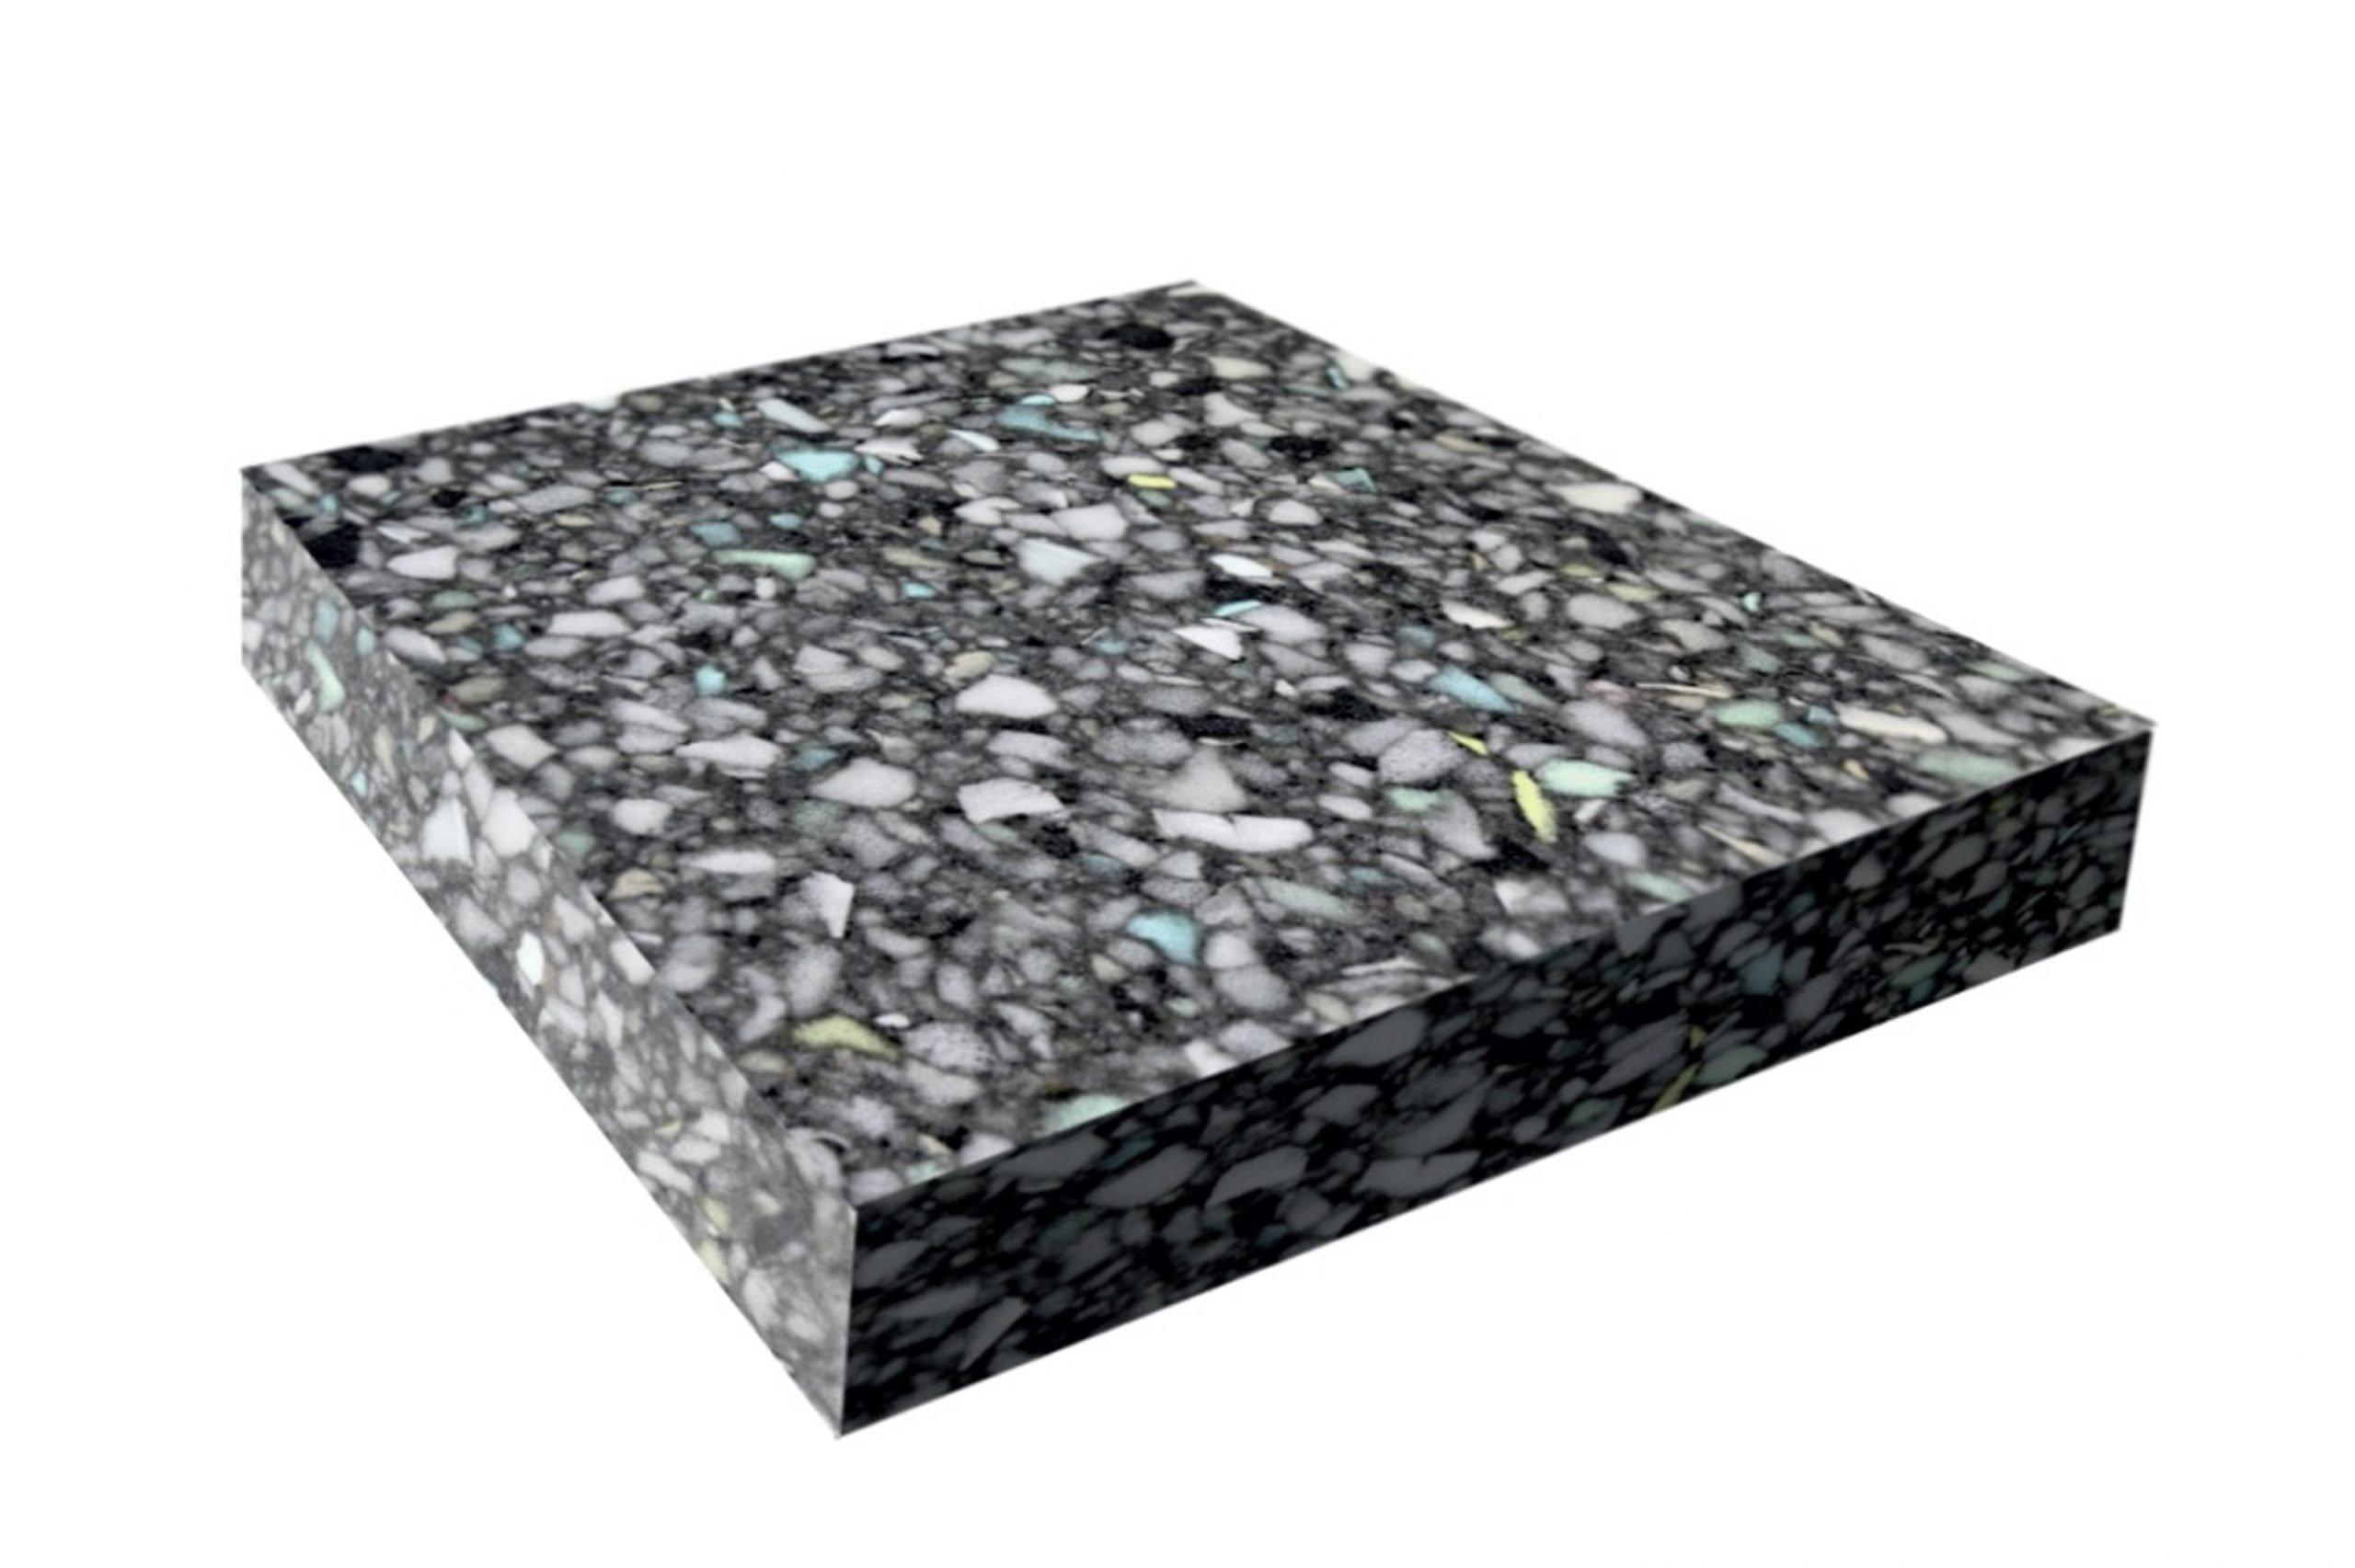 ChovAPREN: Paneles absorbentes para el aislamiento acústico